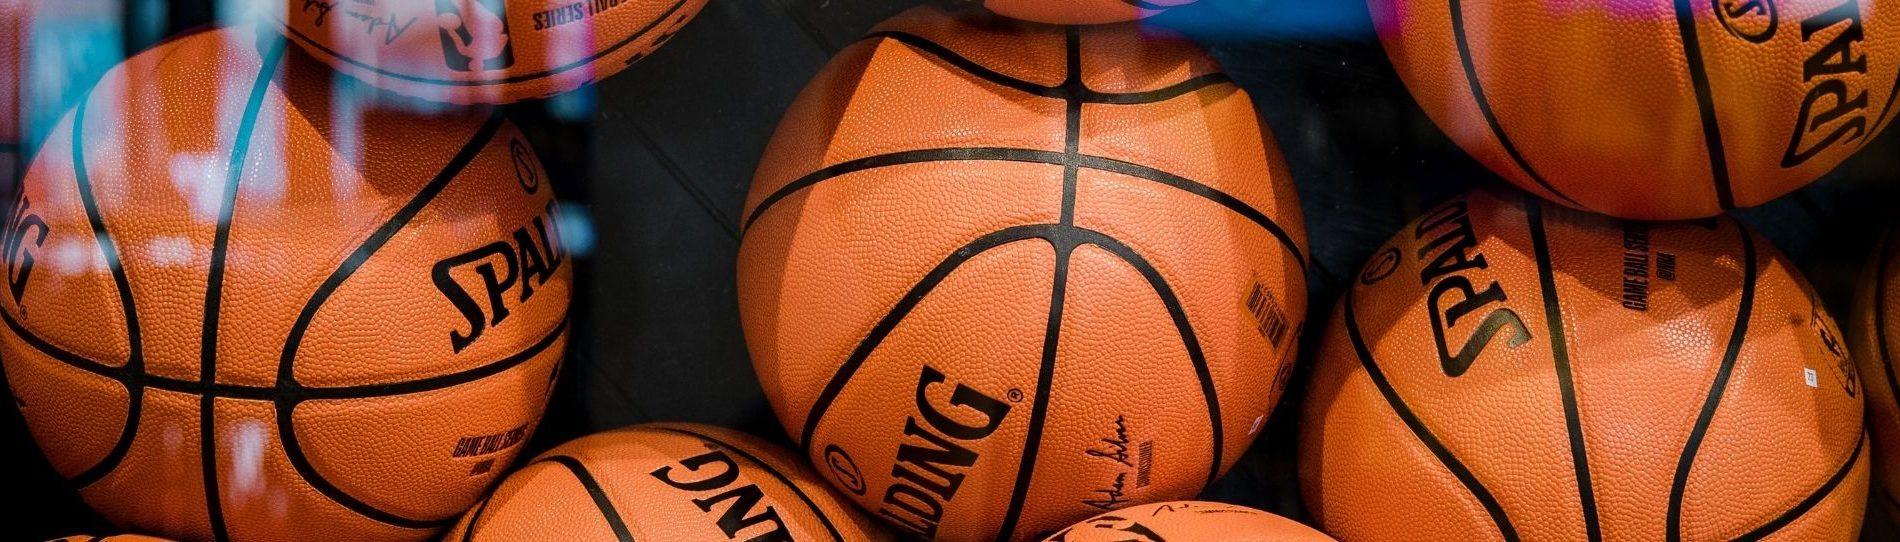 plan-your-basketball-team-trip-header